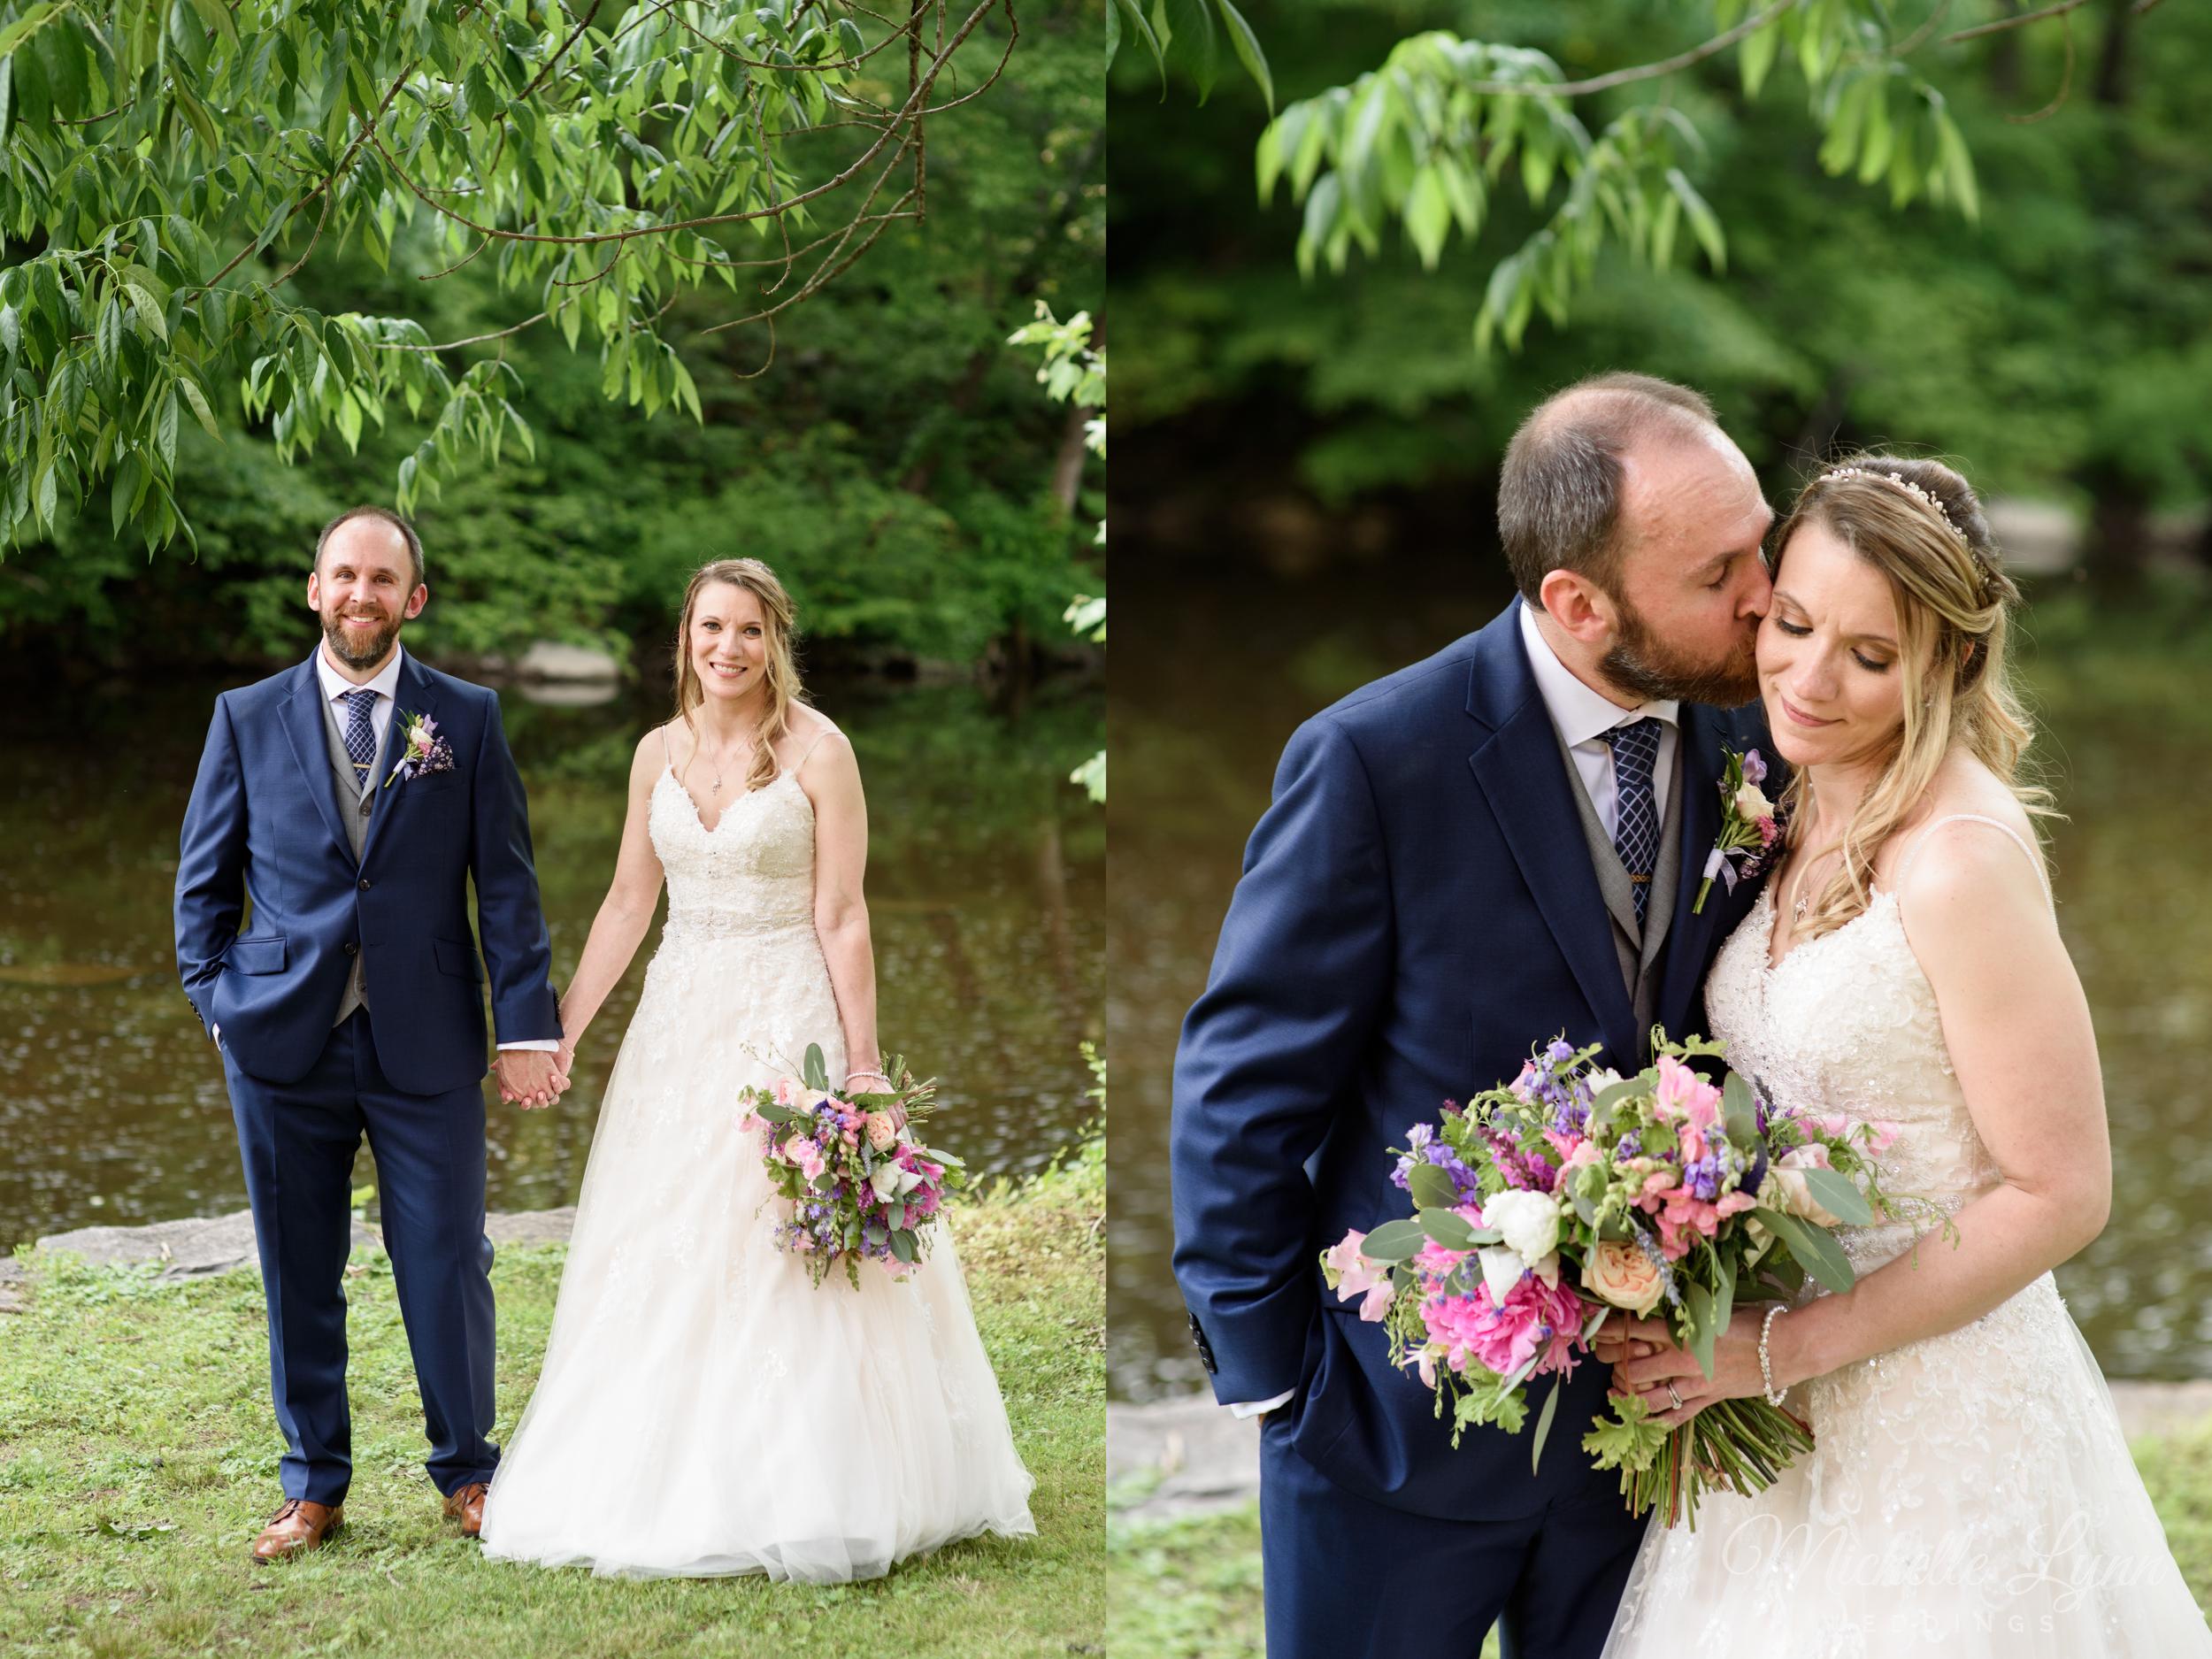 mlw-prallsville-mills-nj-wedding-photographer-57.jpg